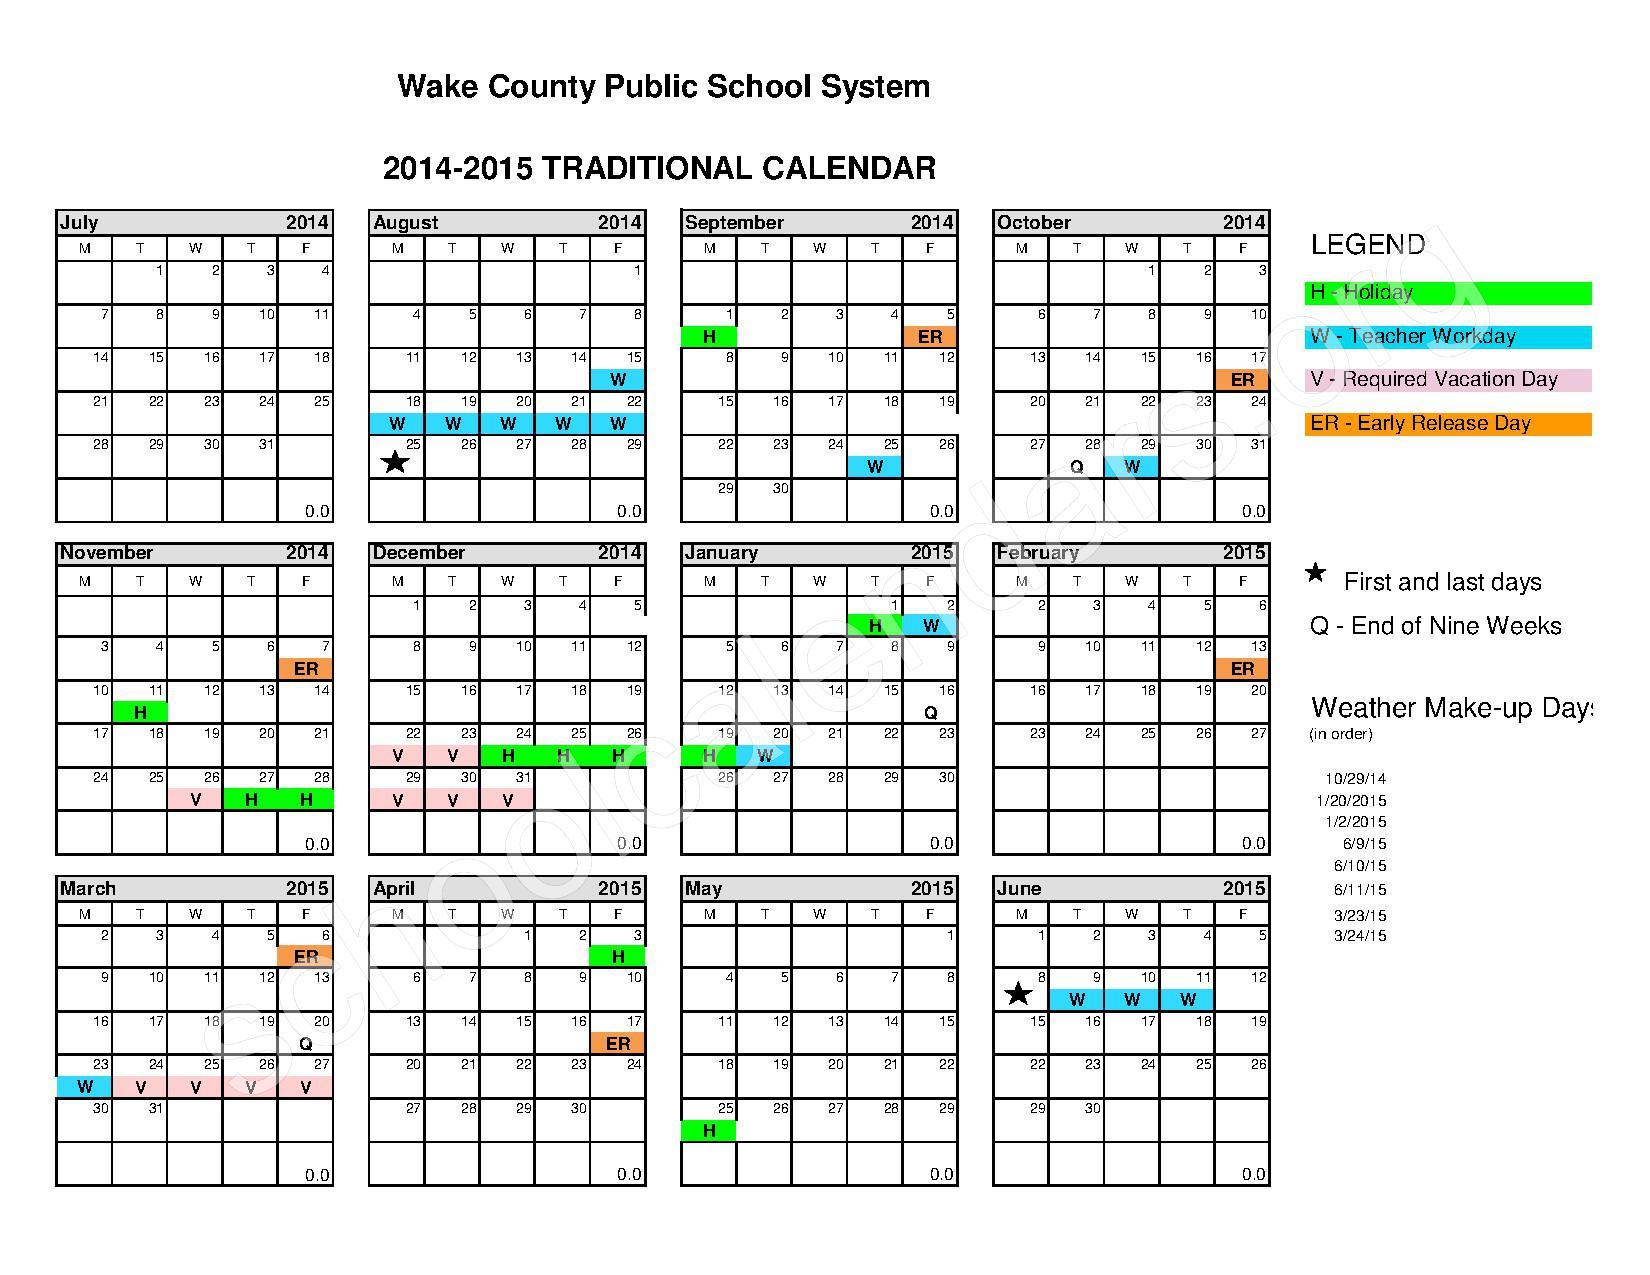 Traditional School Calendar Wake County School Calendars Overview Wake County Public School 2014 2015 Traditional Calendar – Calendar Detail